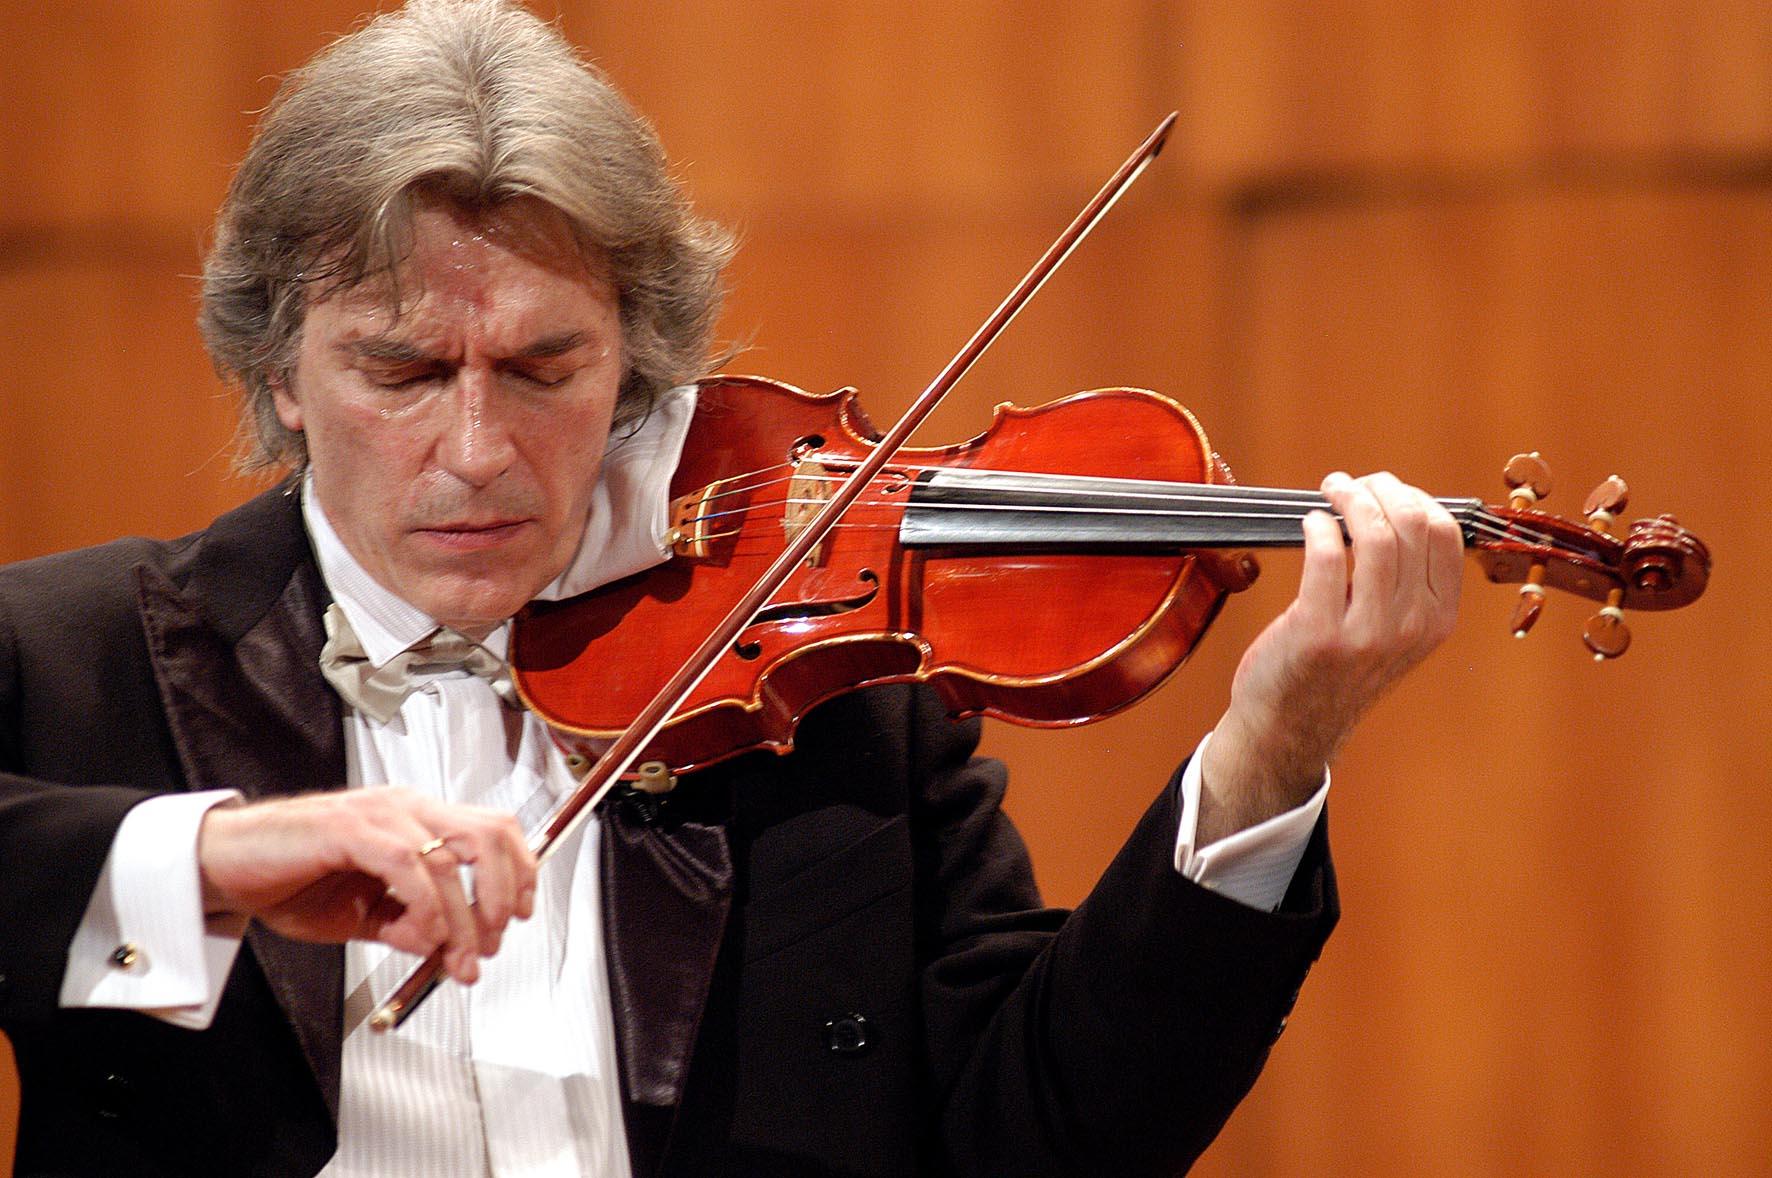 Jovan Kolundžija - violinista, osnivač Centra lepih umetnosti Guarnerius